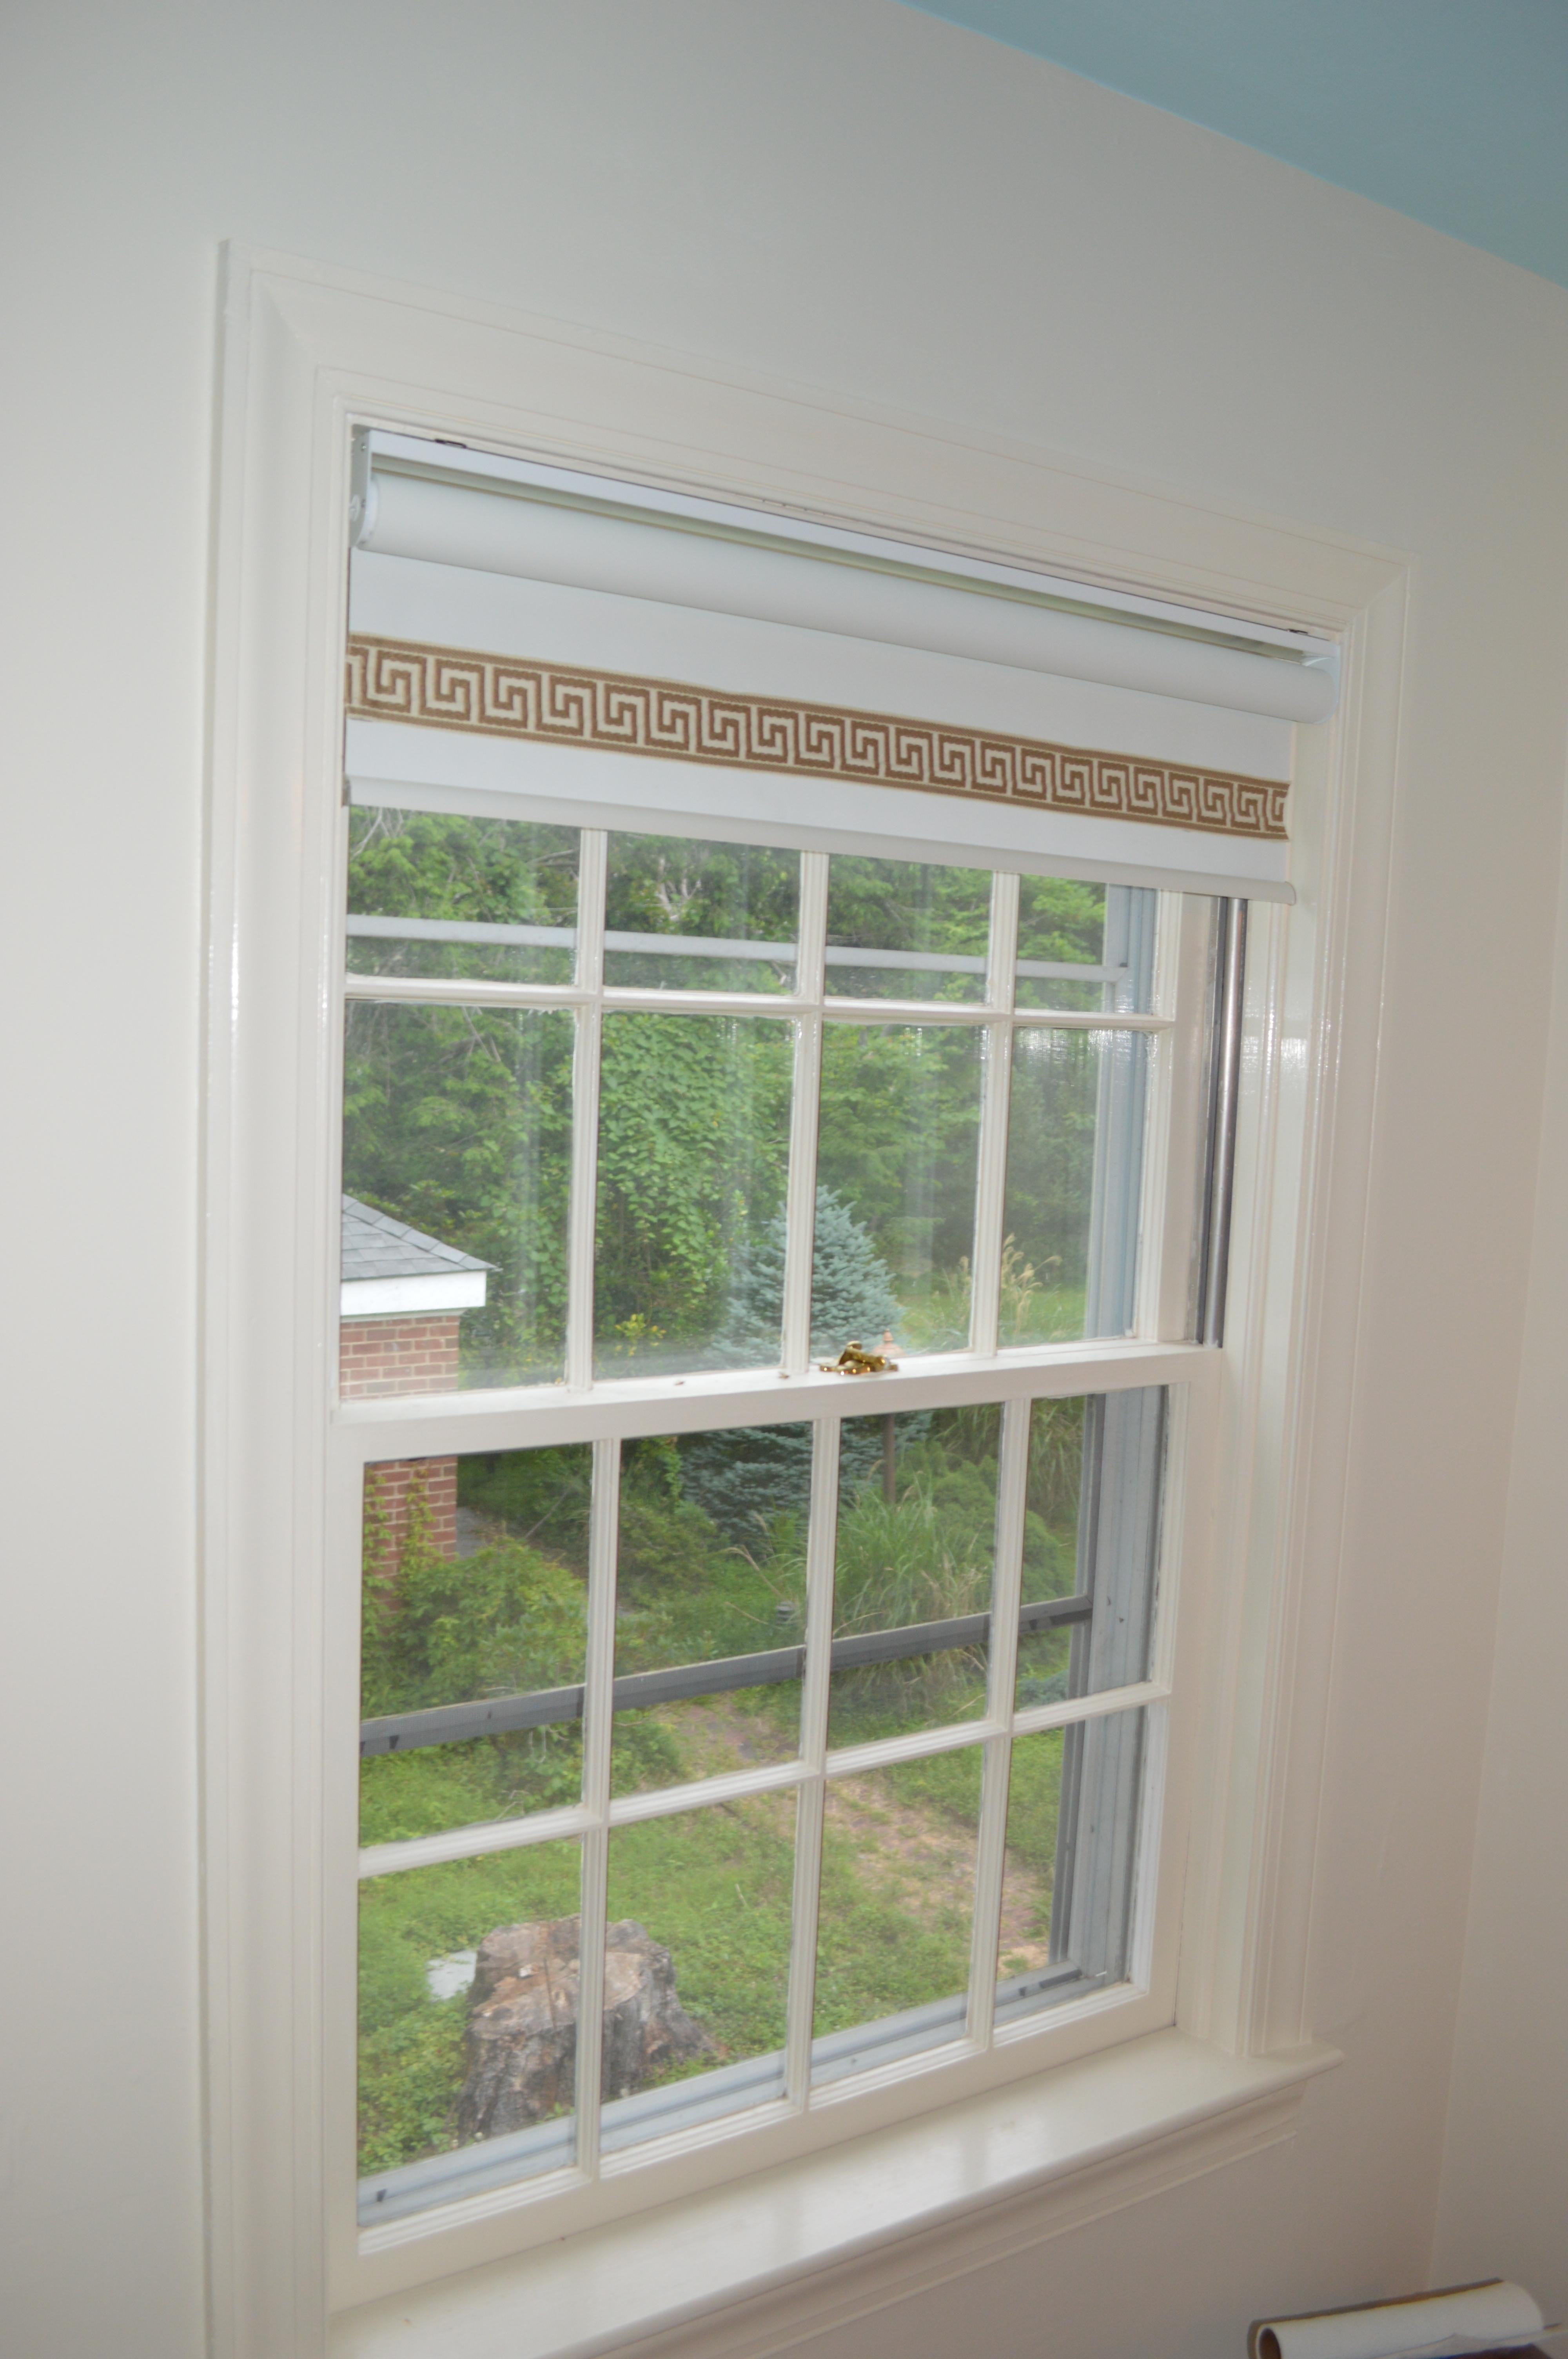 Window Treatments for Nursery